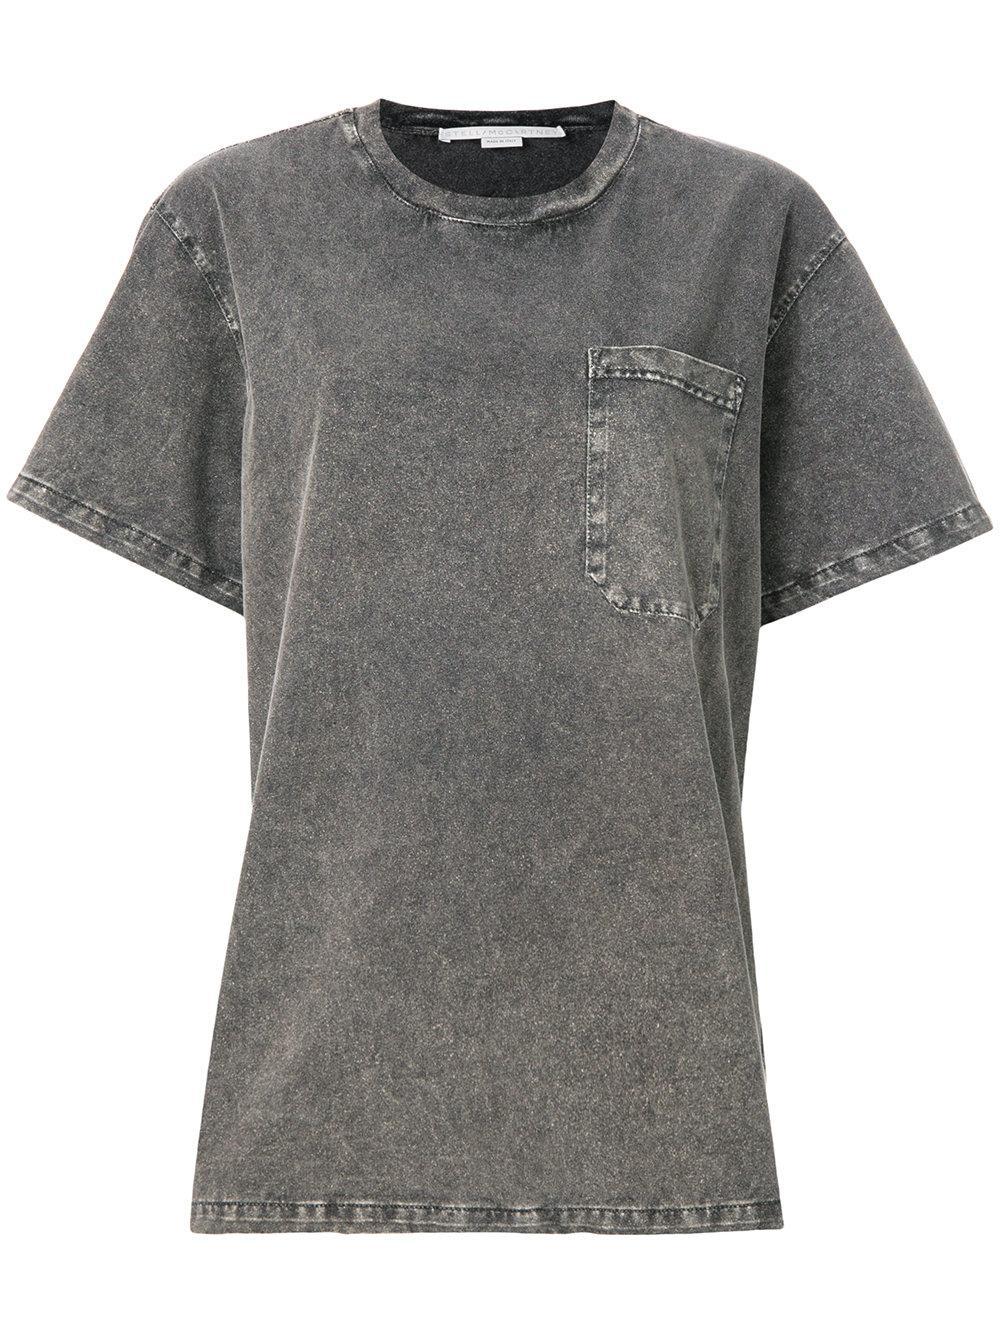 Stella Mccartney Faded Oversized T-shirt - Grey